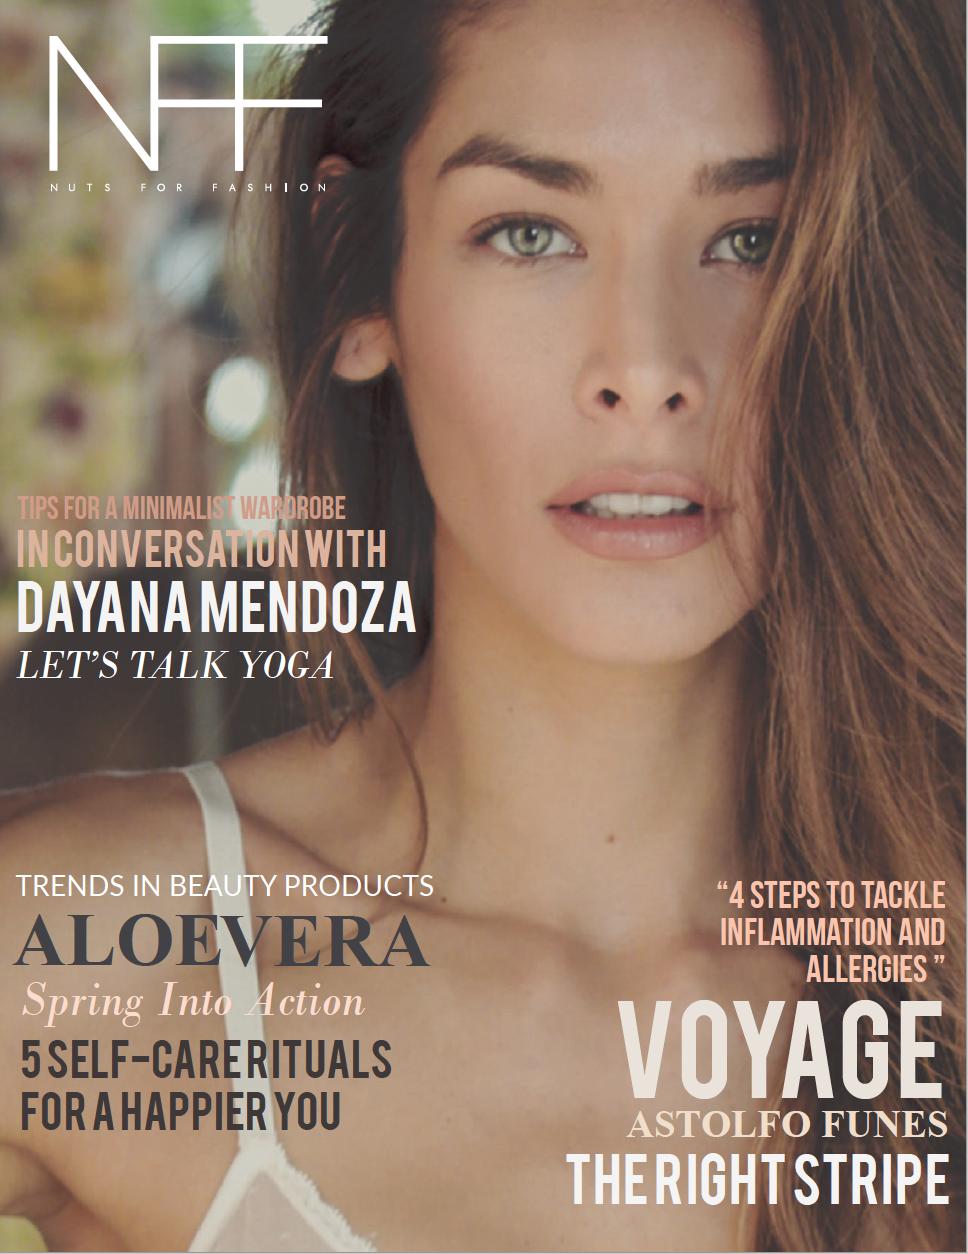 Dayana Mendoza Nuts for Fashion